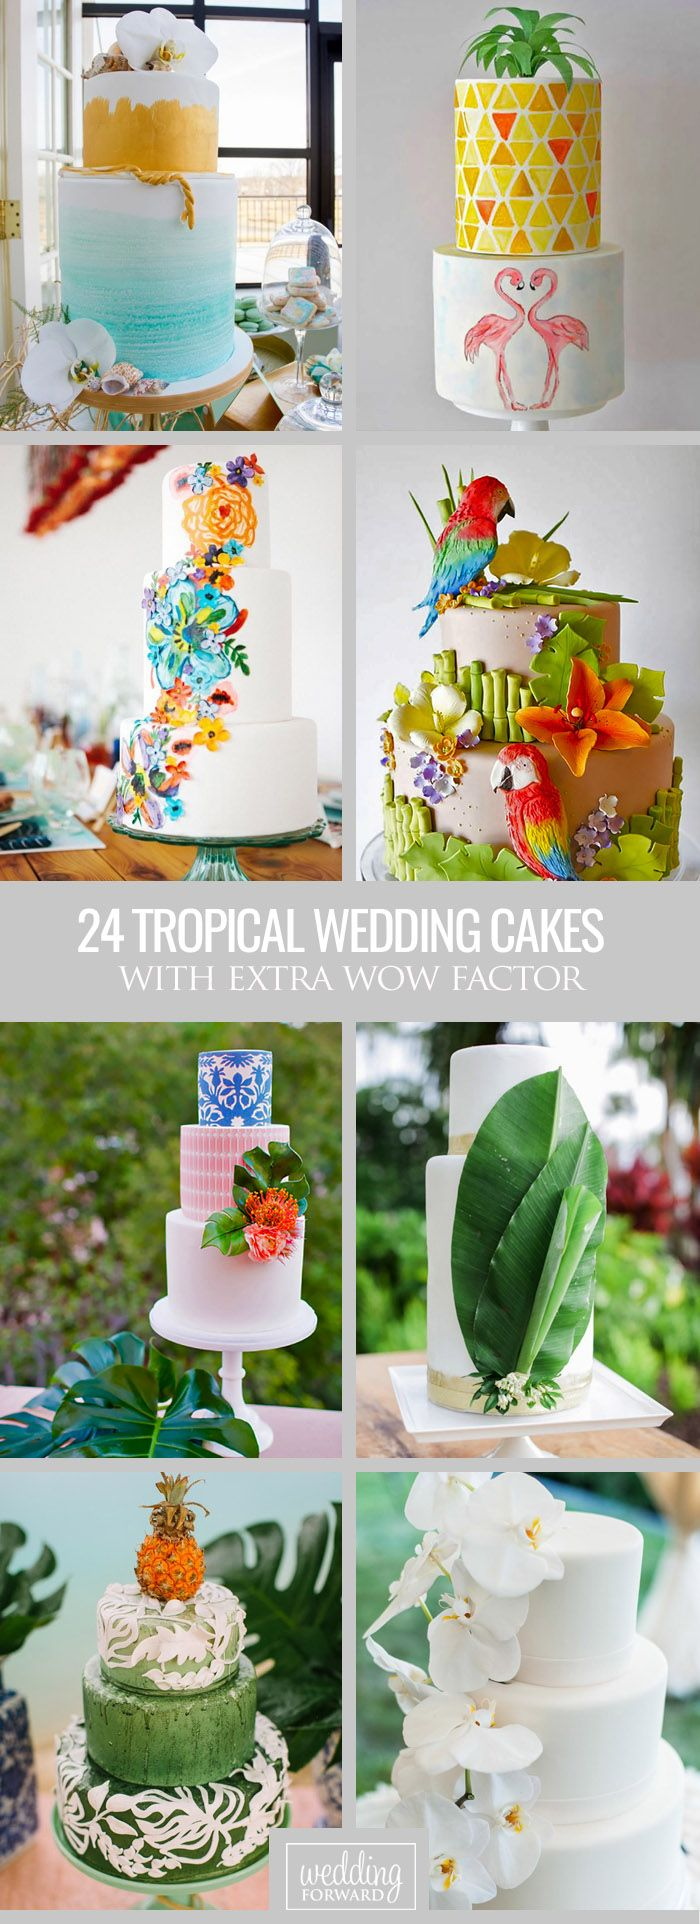 best 25+ tropical wedding decor ideas only on pinterest | garden